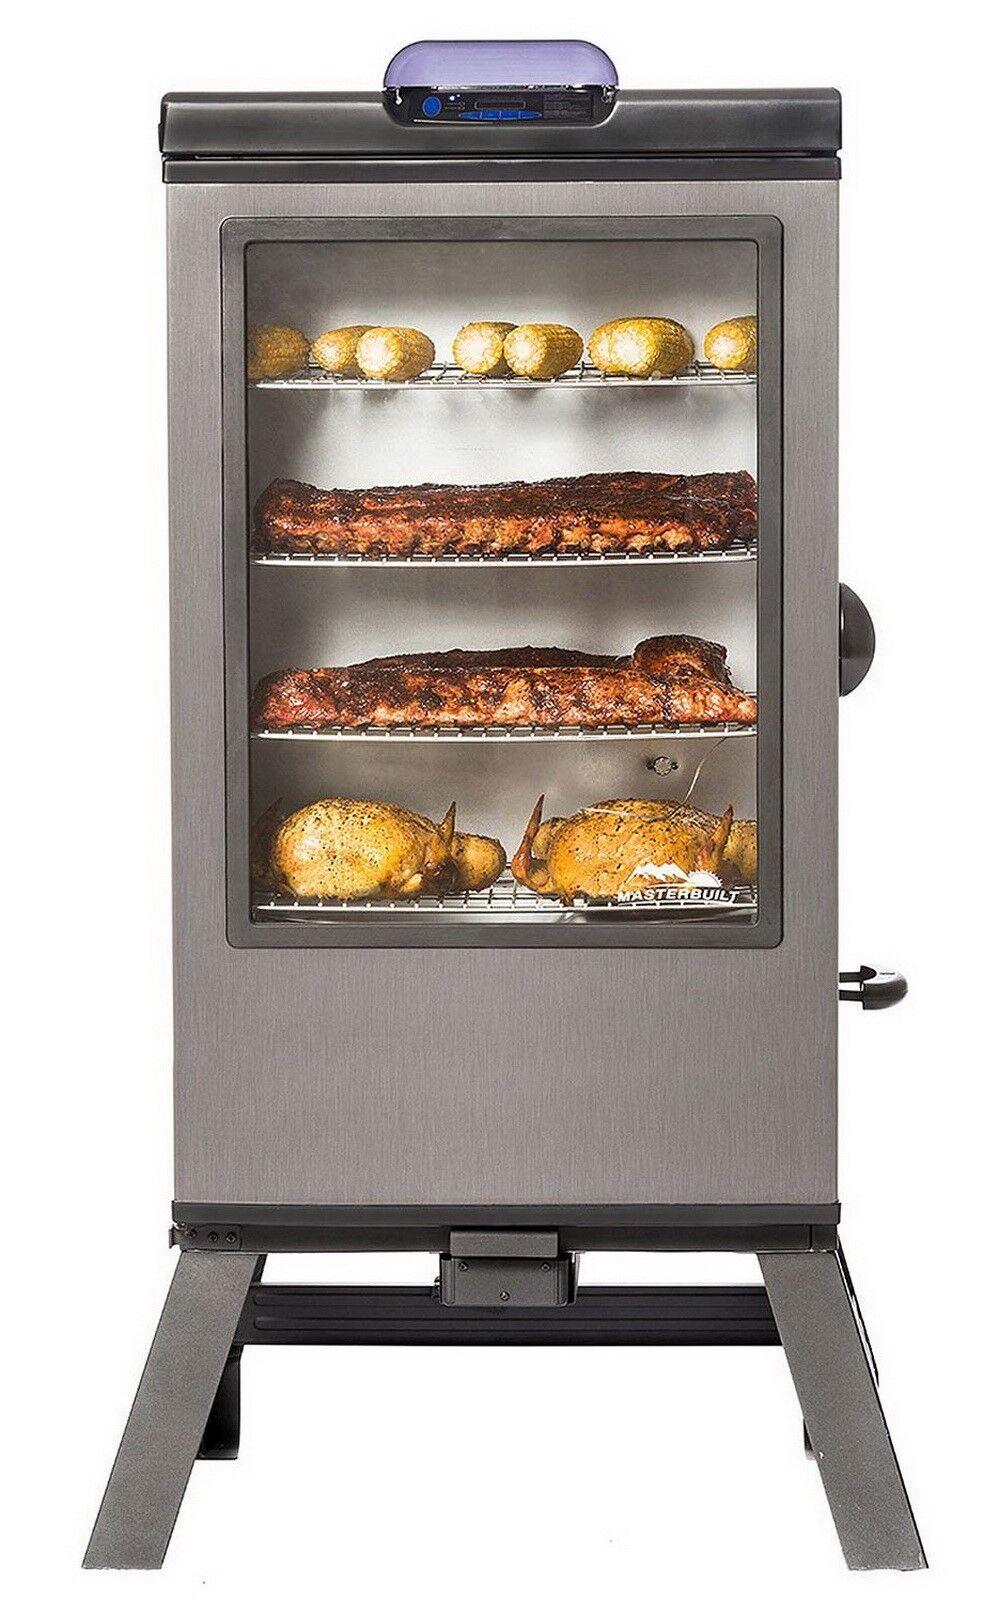 masterbuilt electric meat smoker 40 inch bbq 4 racks cooker